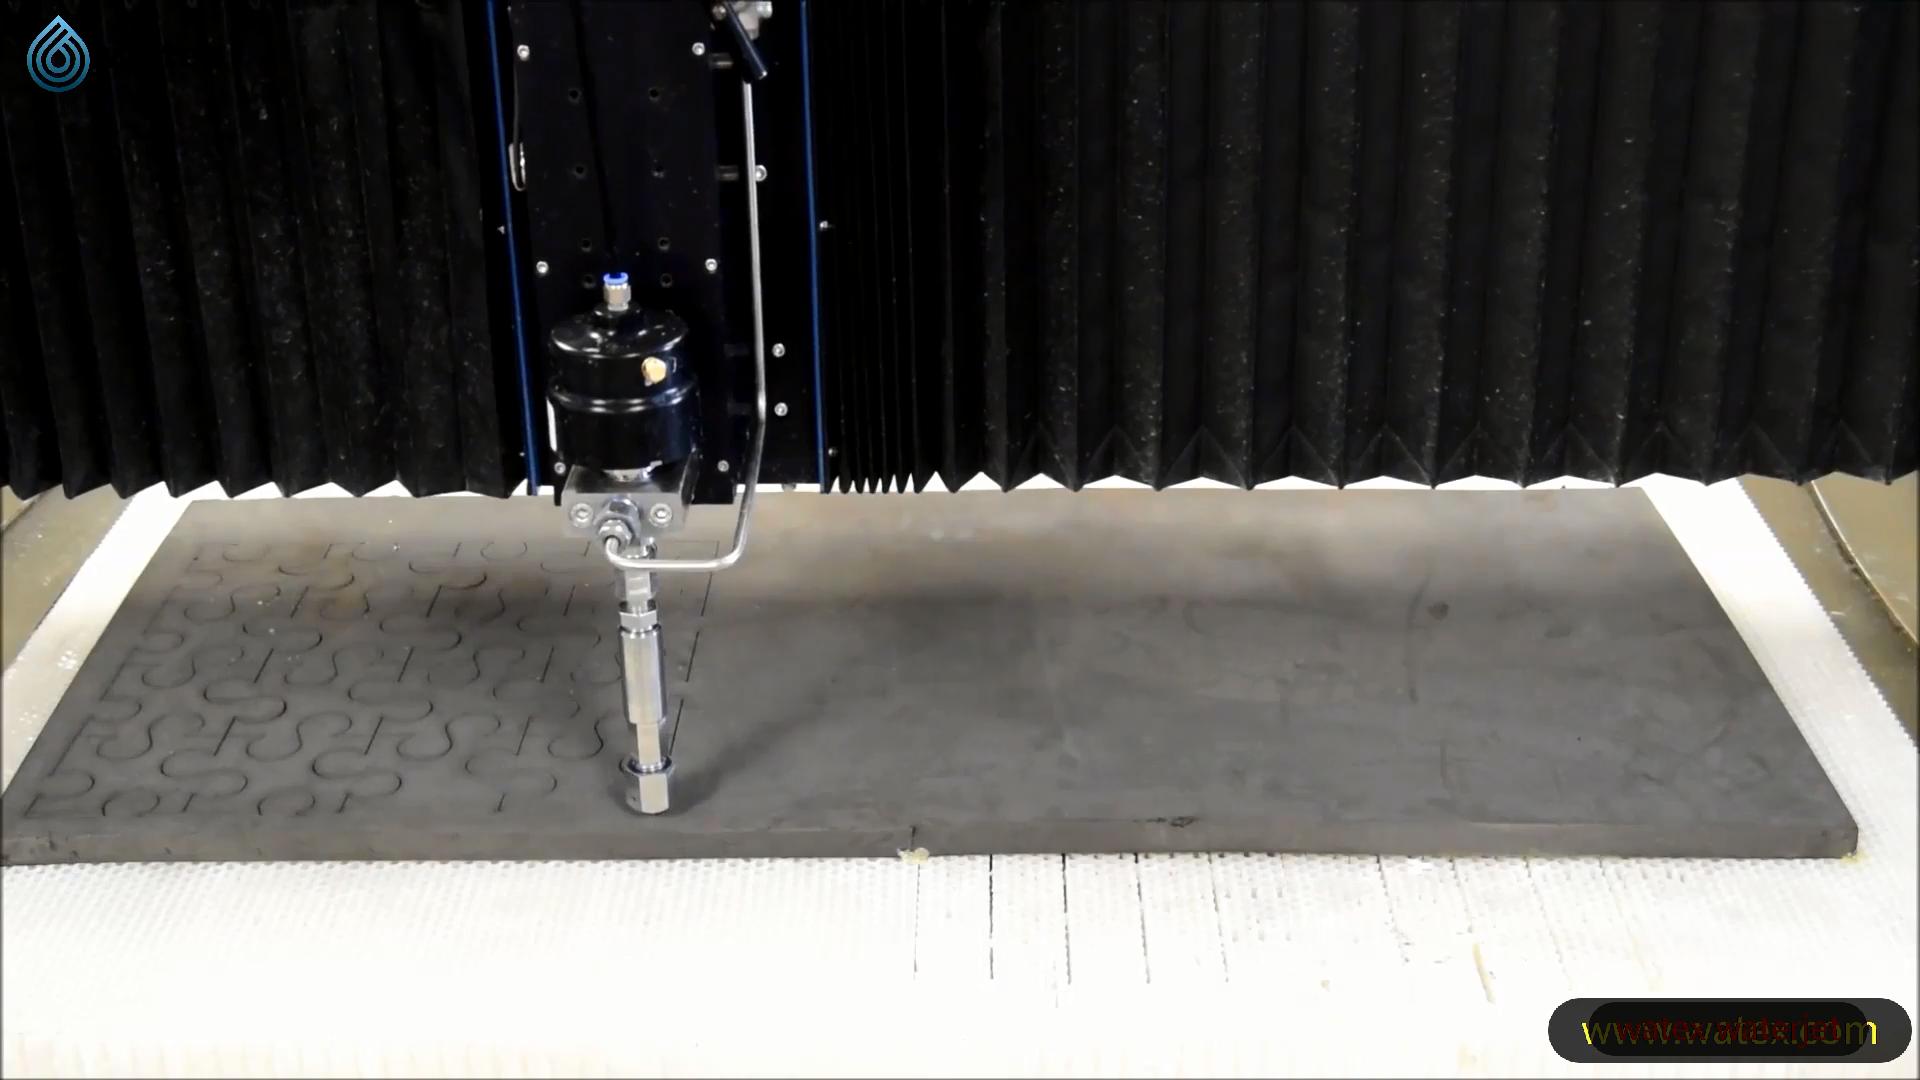 Waterjet חיתוך מכונת waterjet חותך עבור השיש גרניט חיתוך